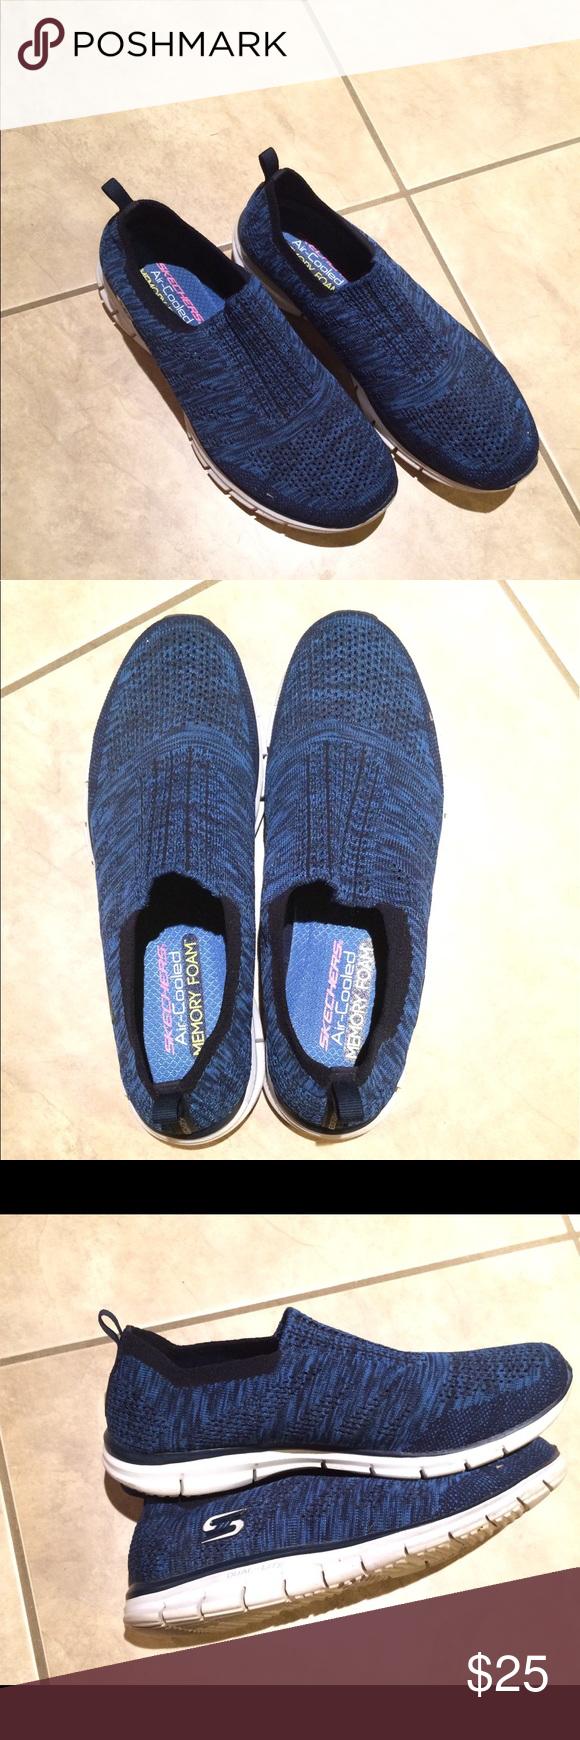 Mens skechers, Skechers shoes